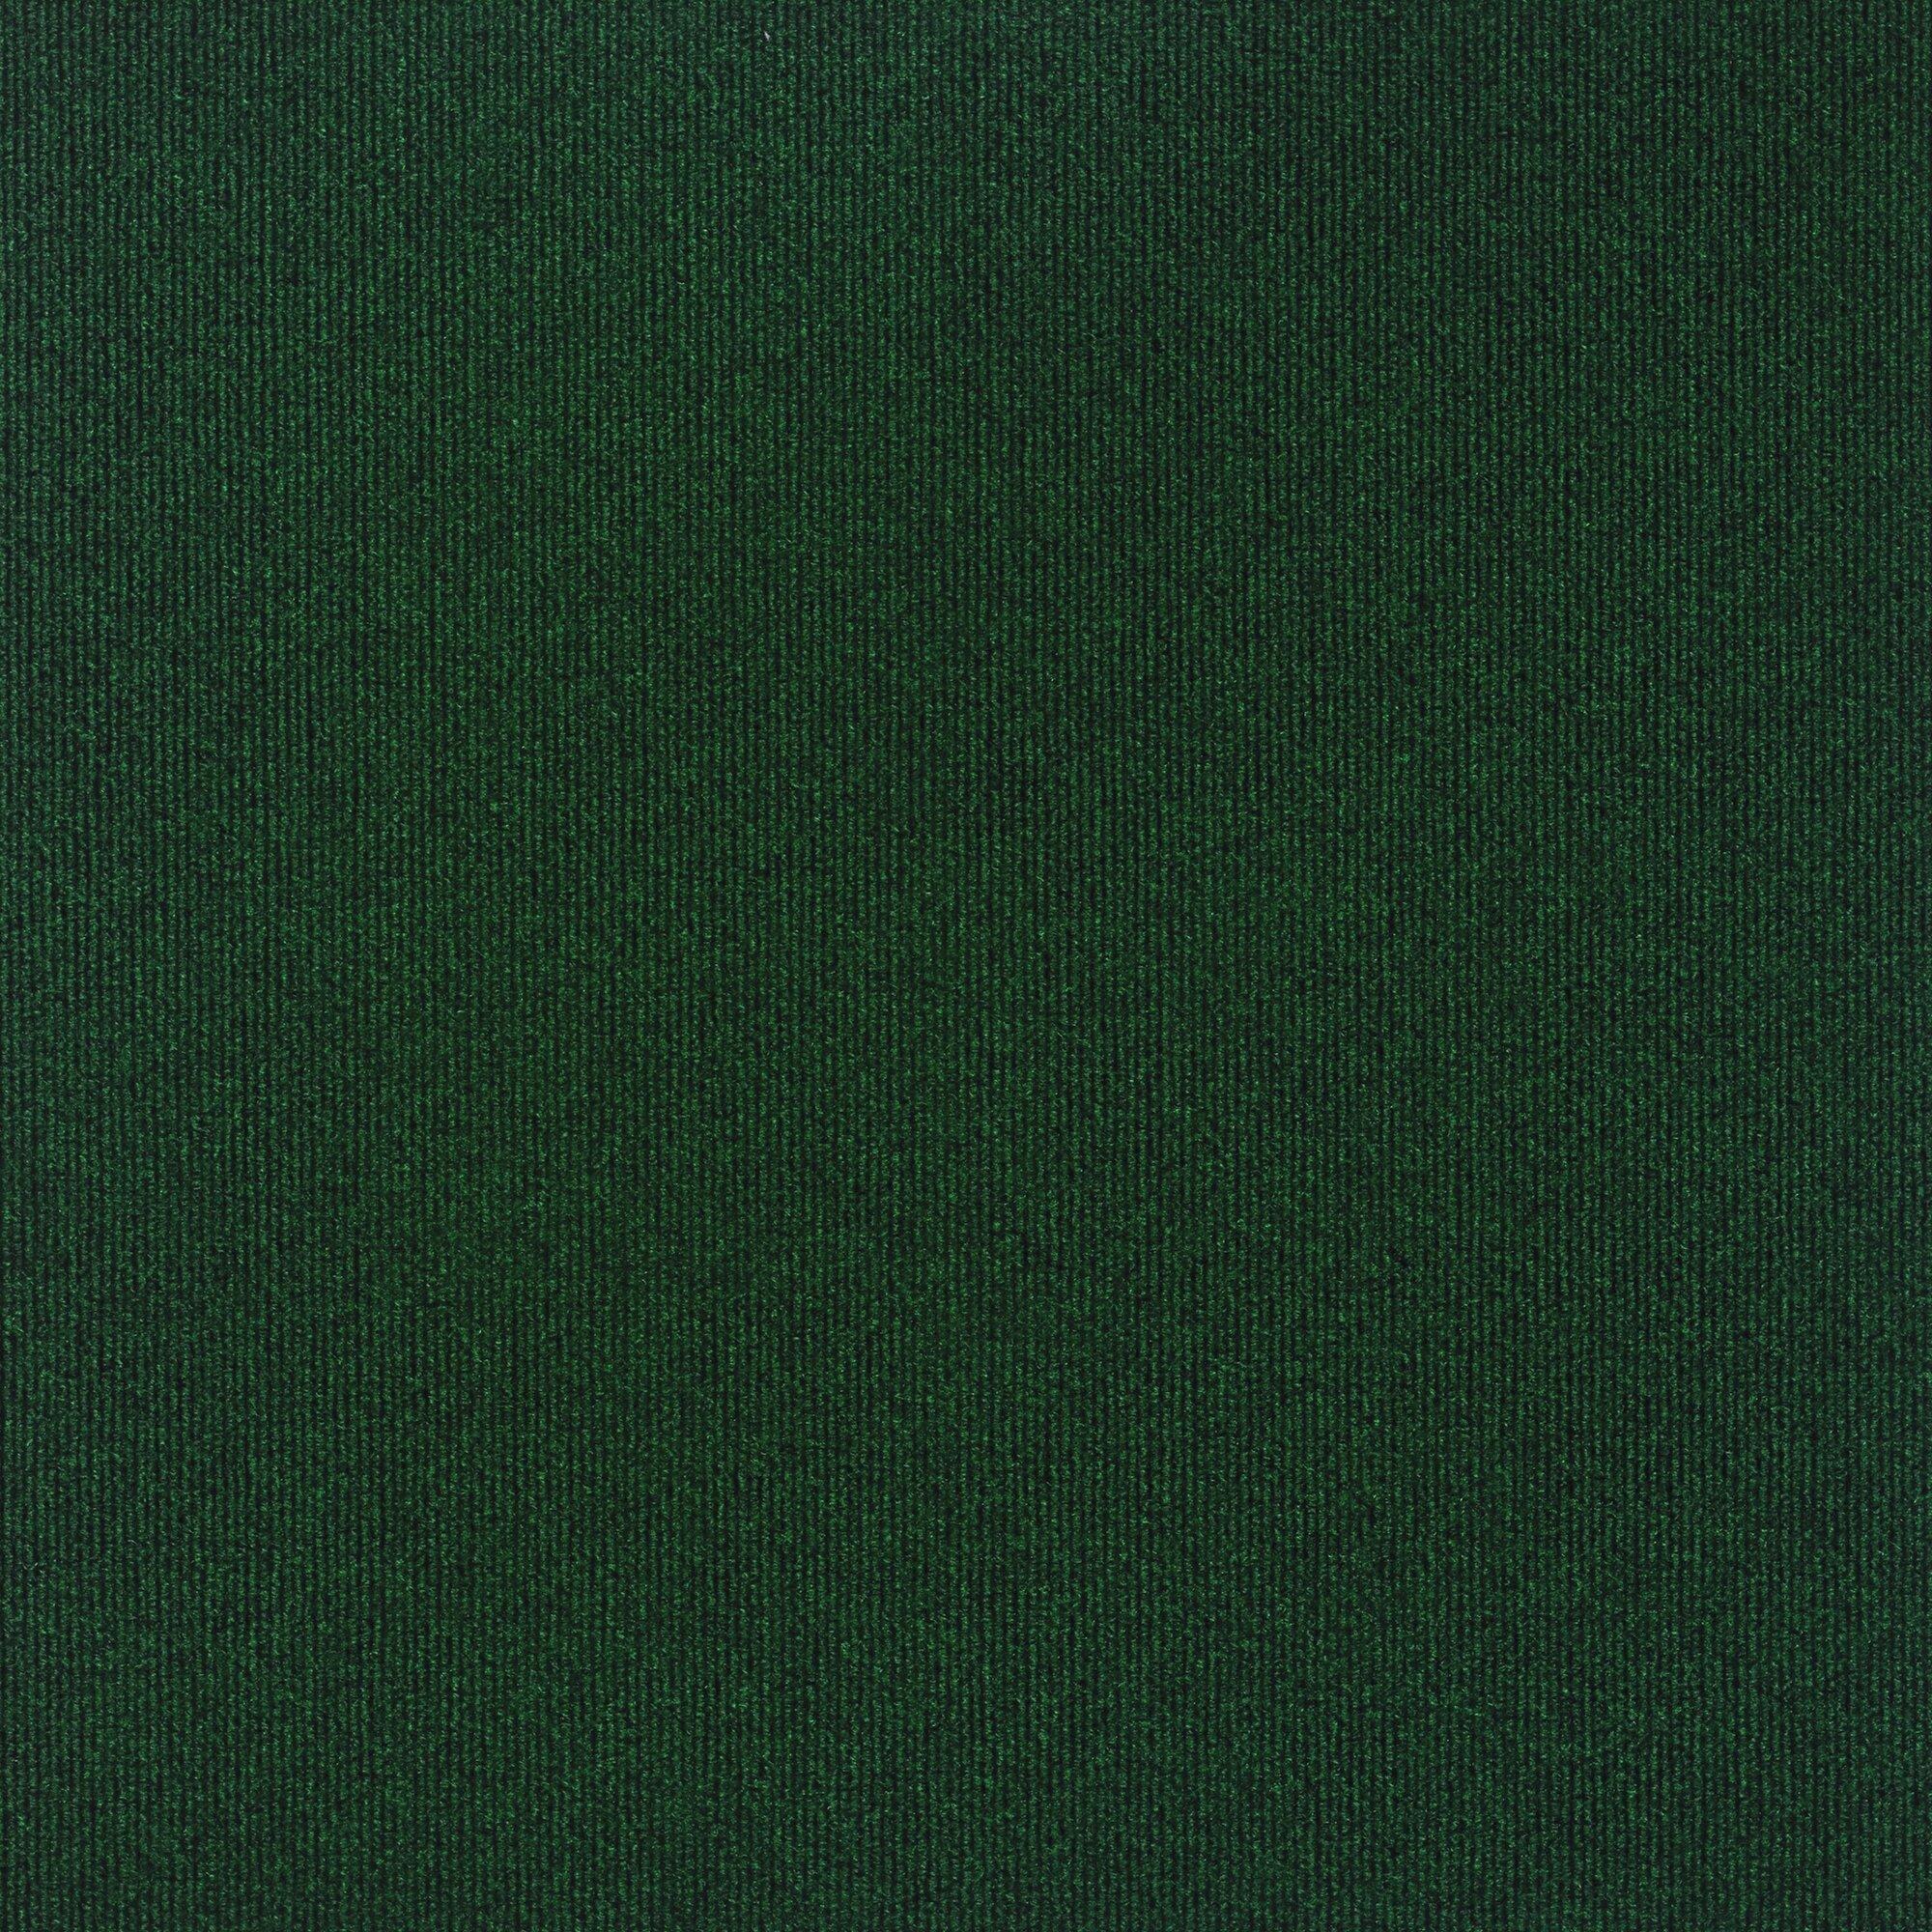 24 X 24 Tile Dimension Green Carpet Tiles You Ll Love In 2021 Wayfair